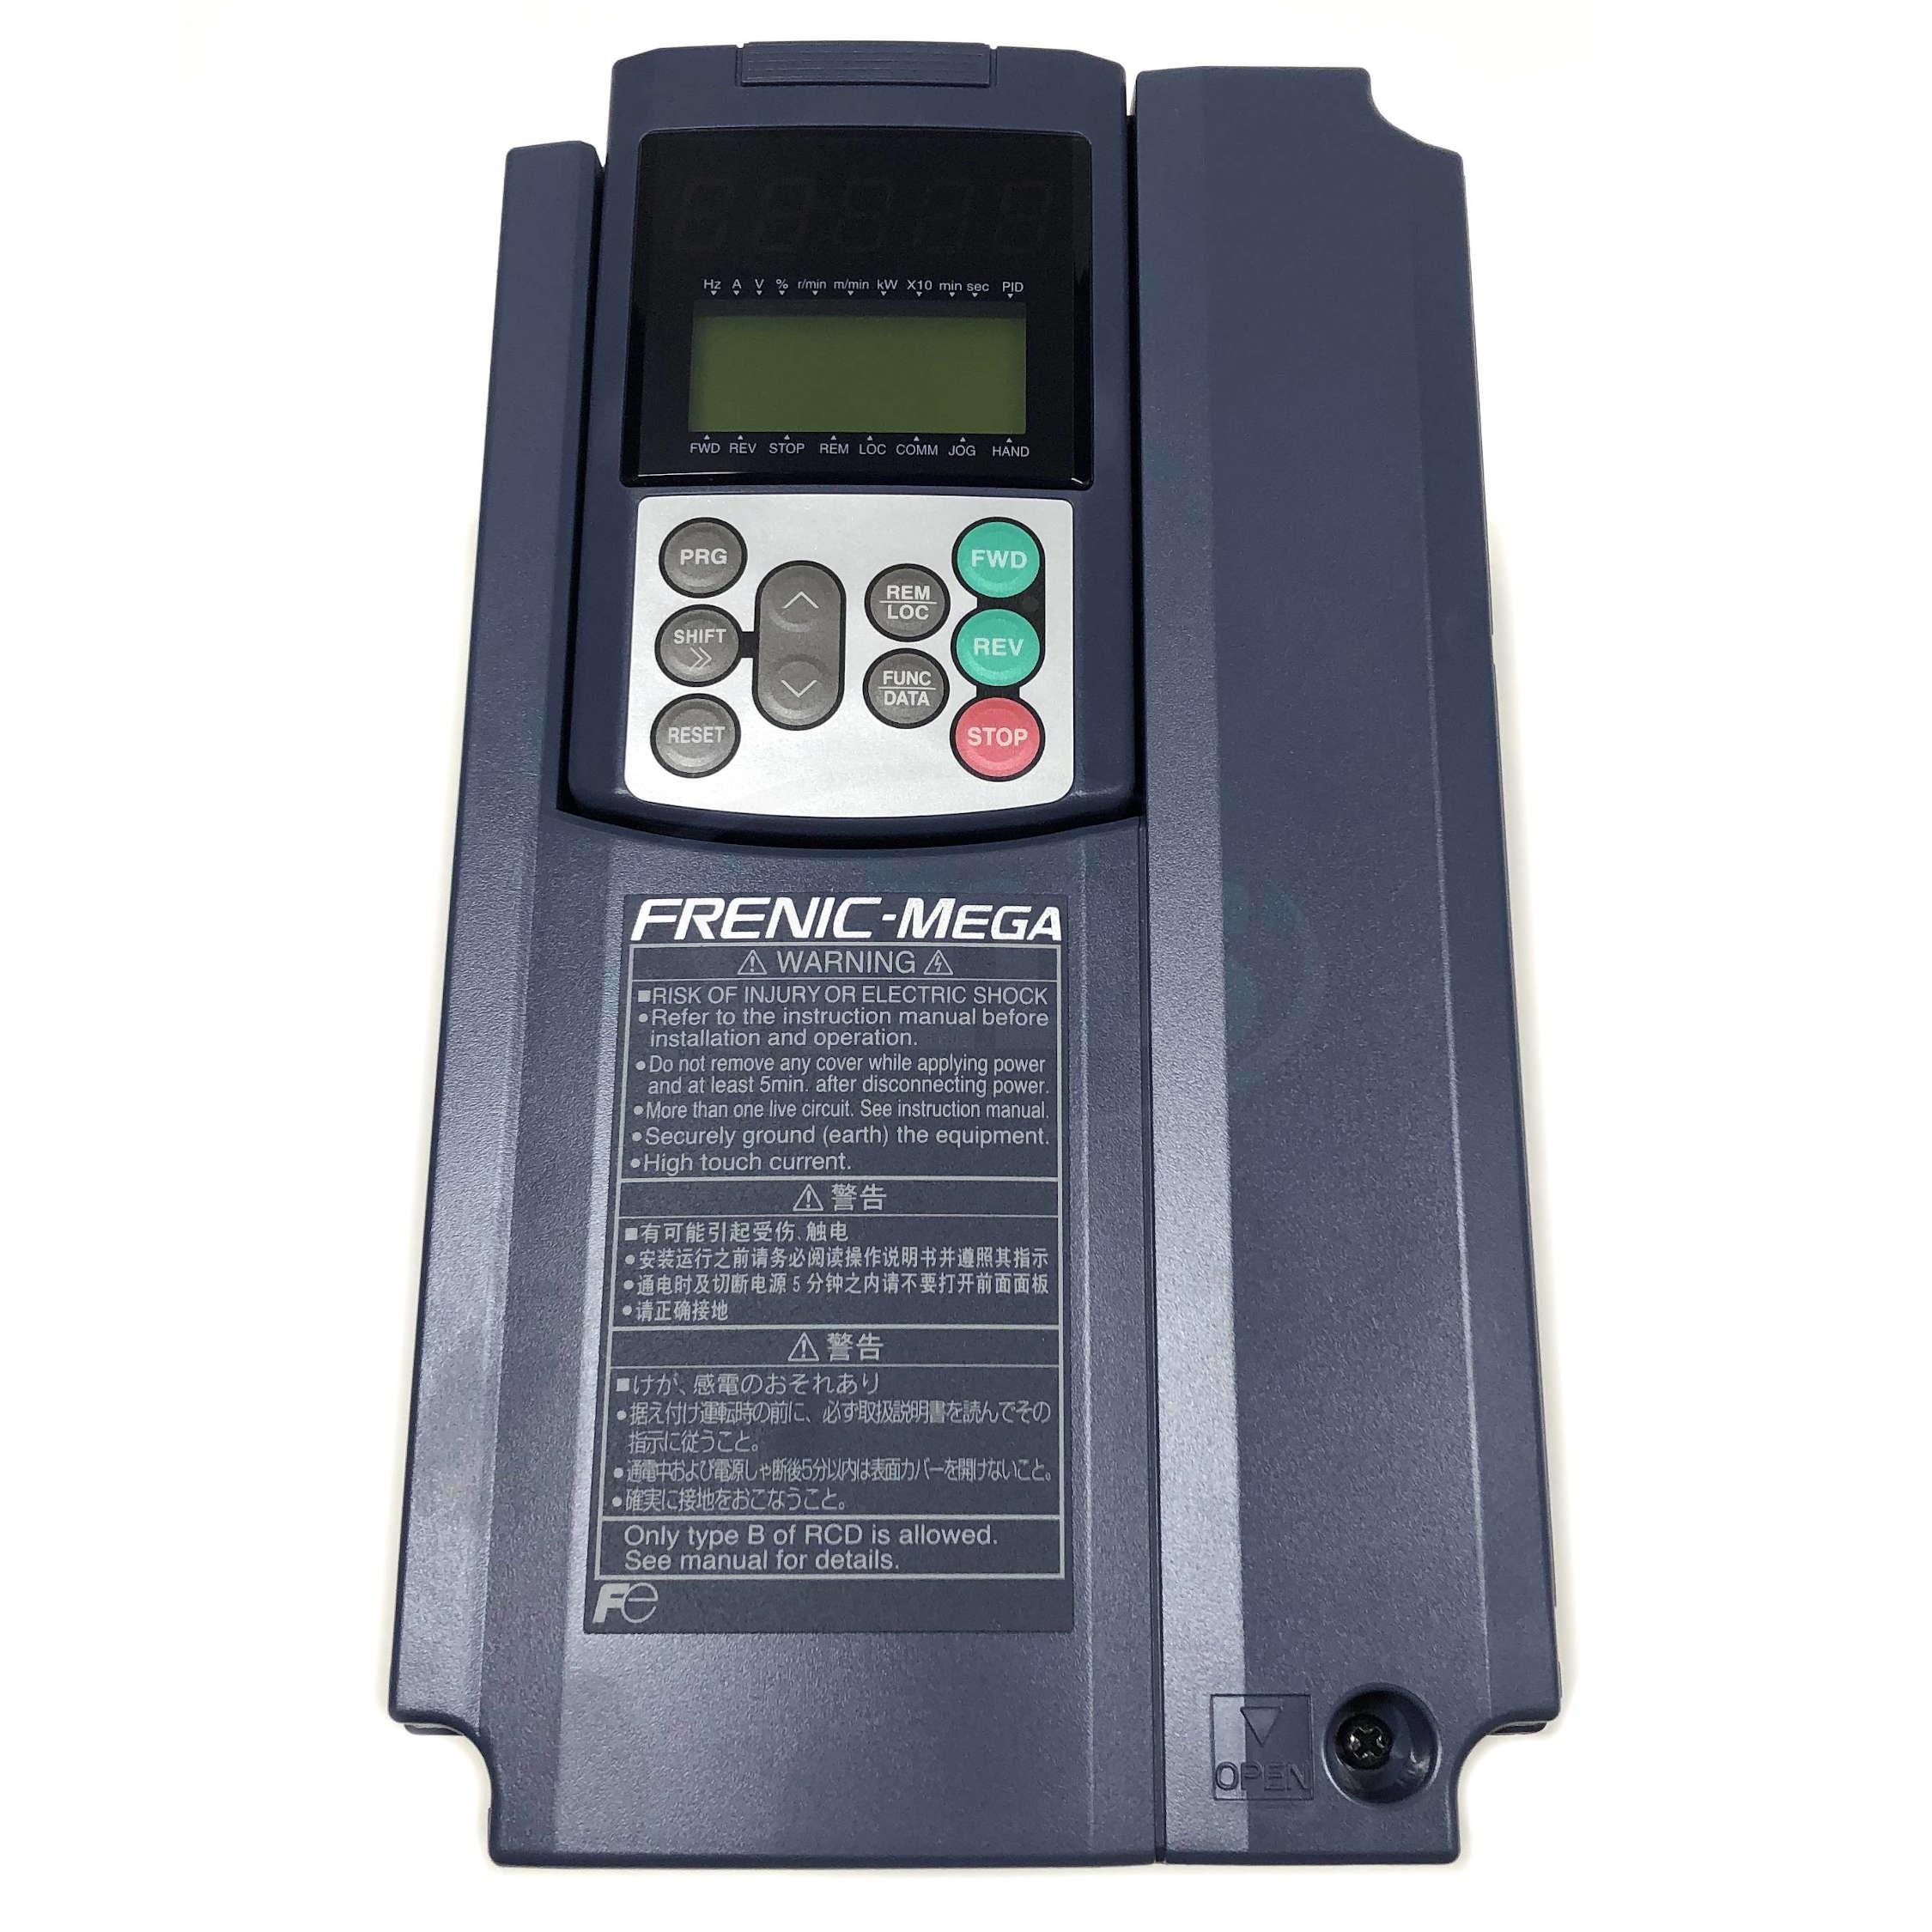 Frn003g1s 2u 3 Hp Fuji Frenic Mega Inverter Vfd 230v